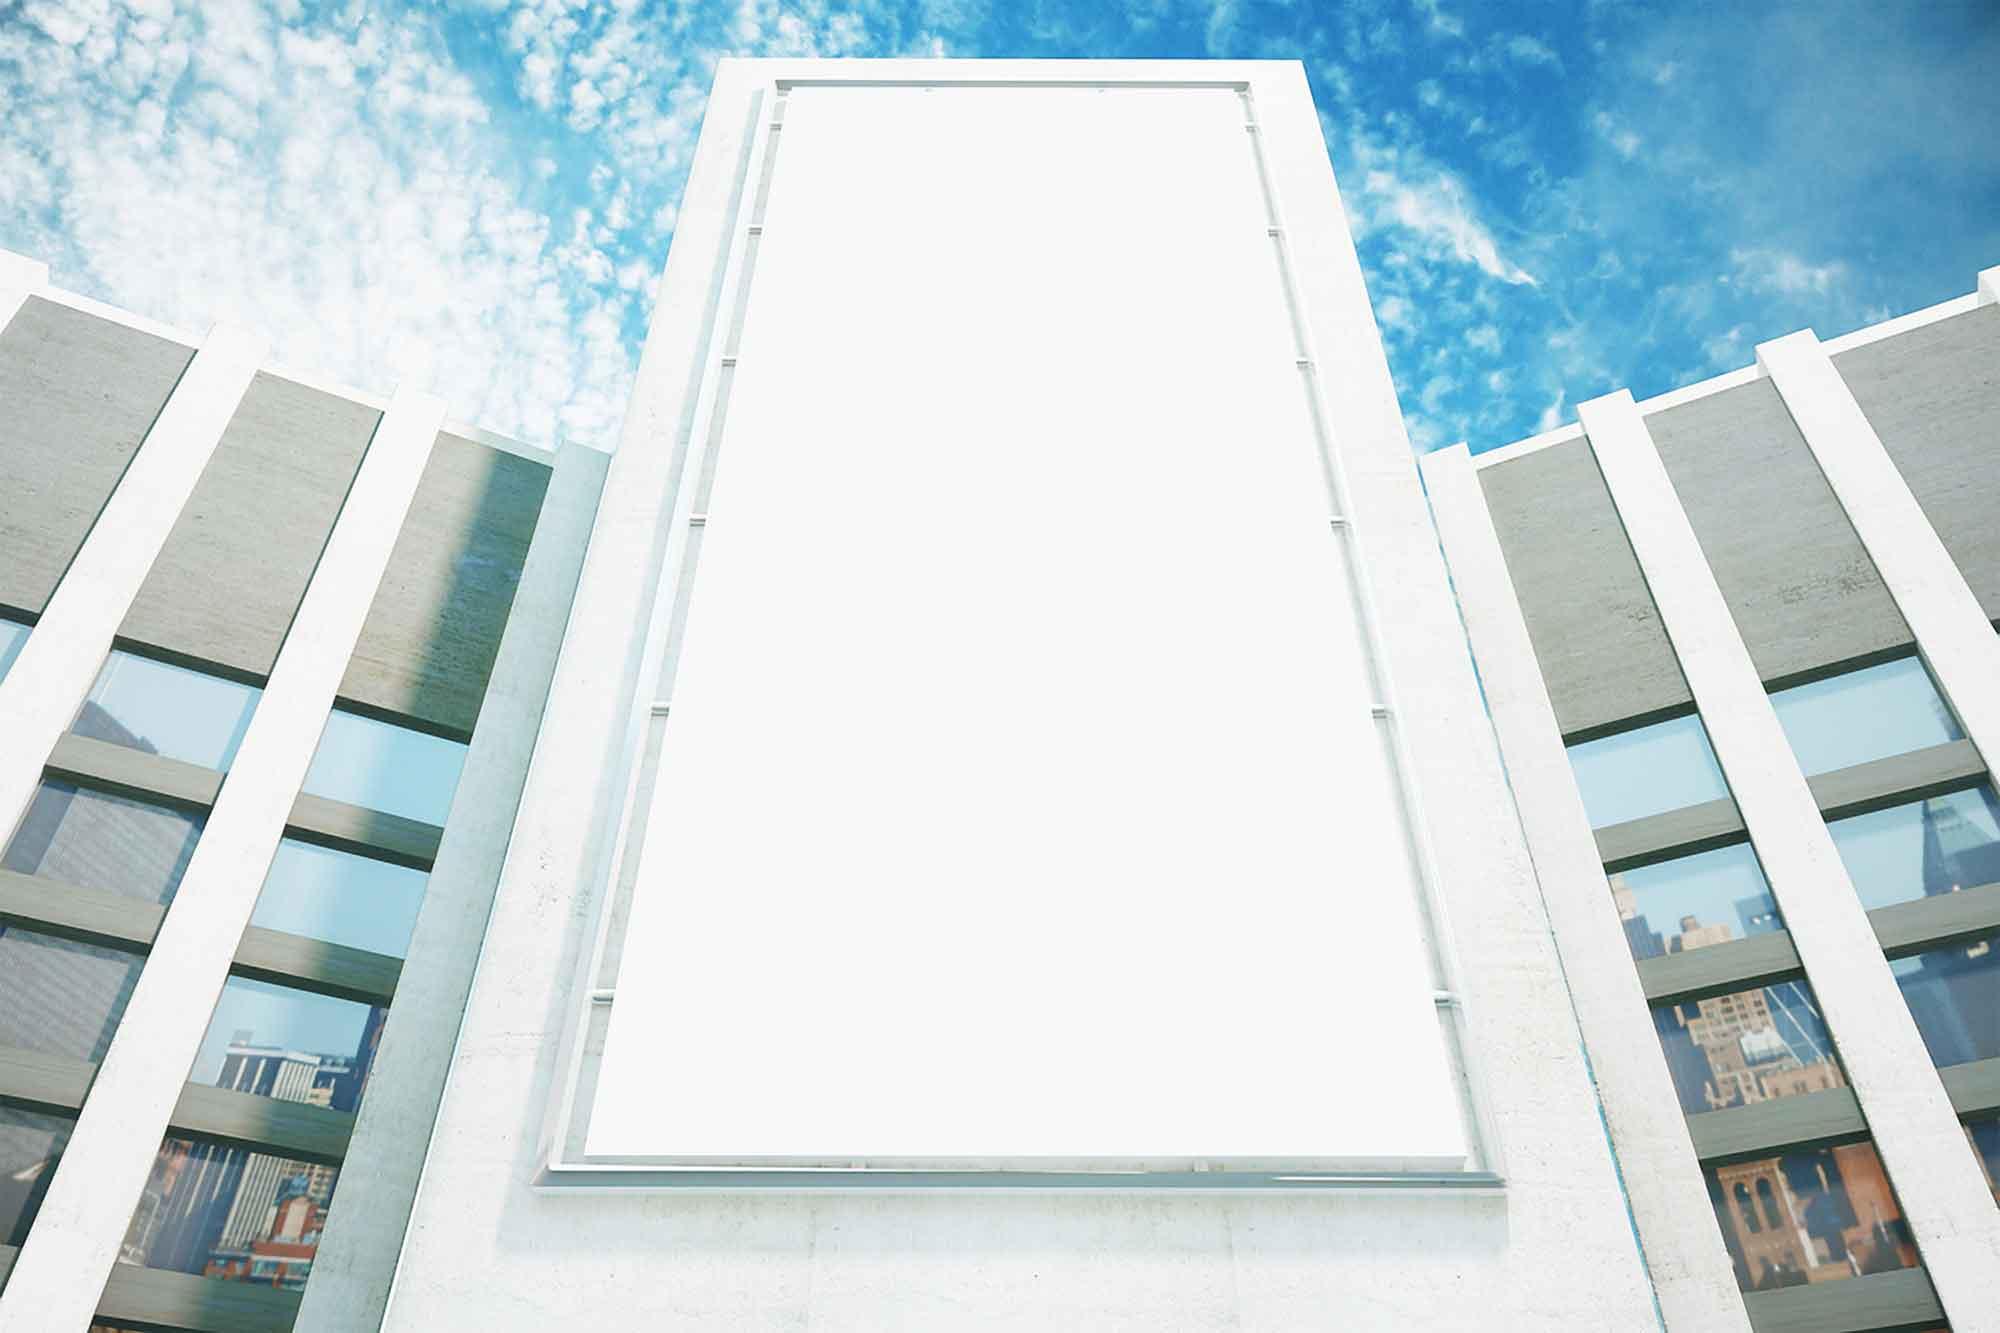 Vertical Advertising Building Billboard Mockup 2